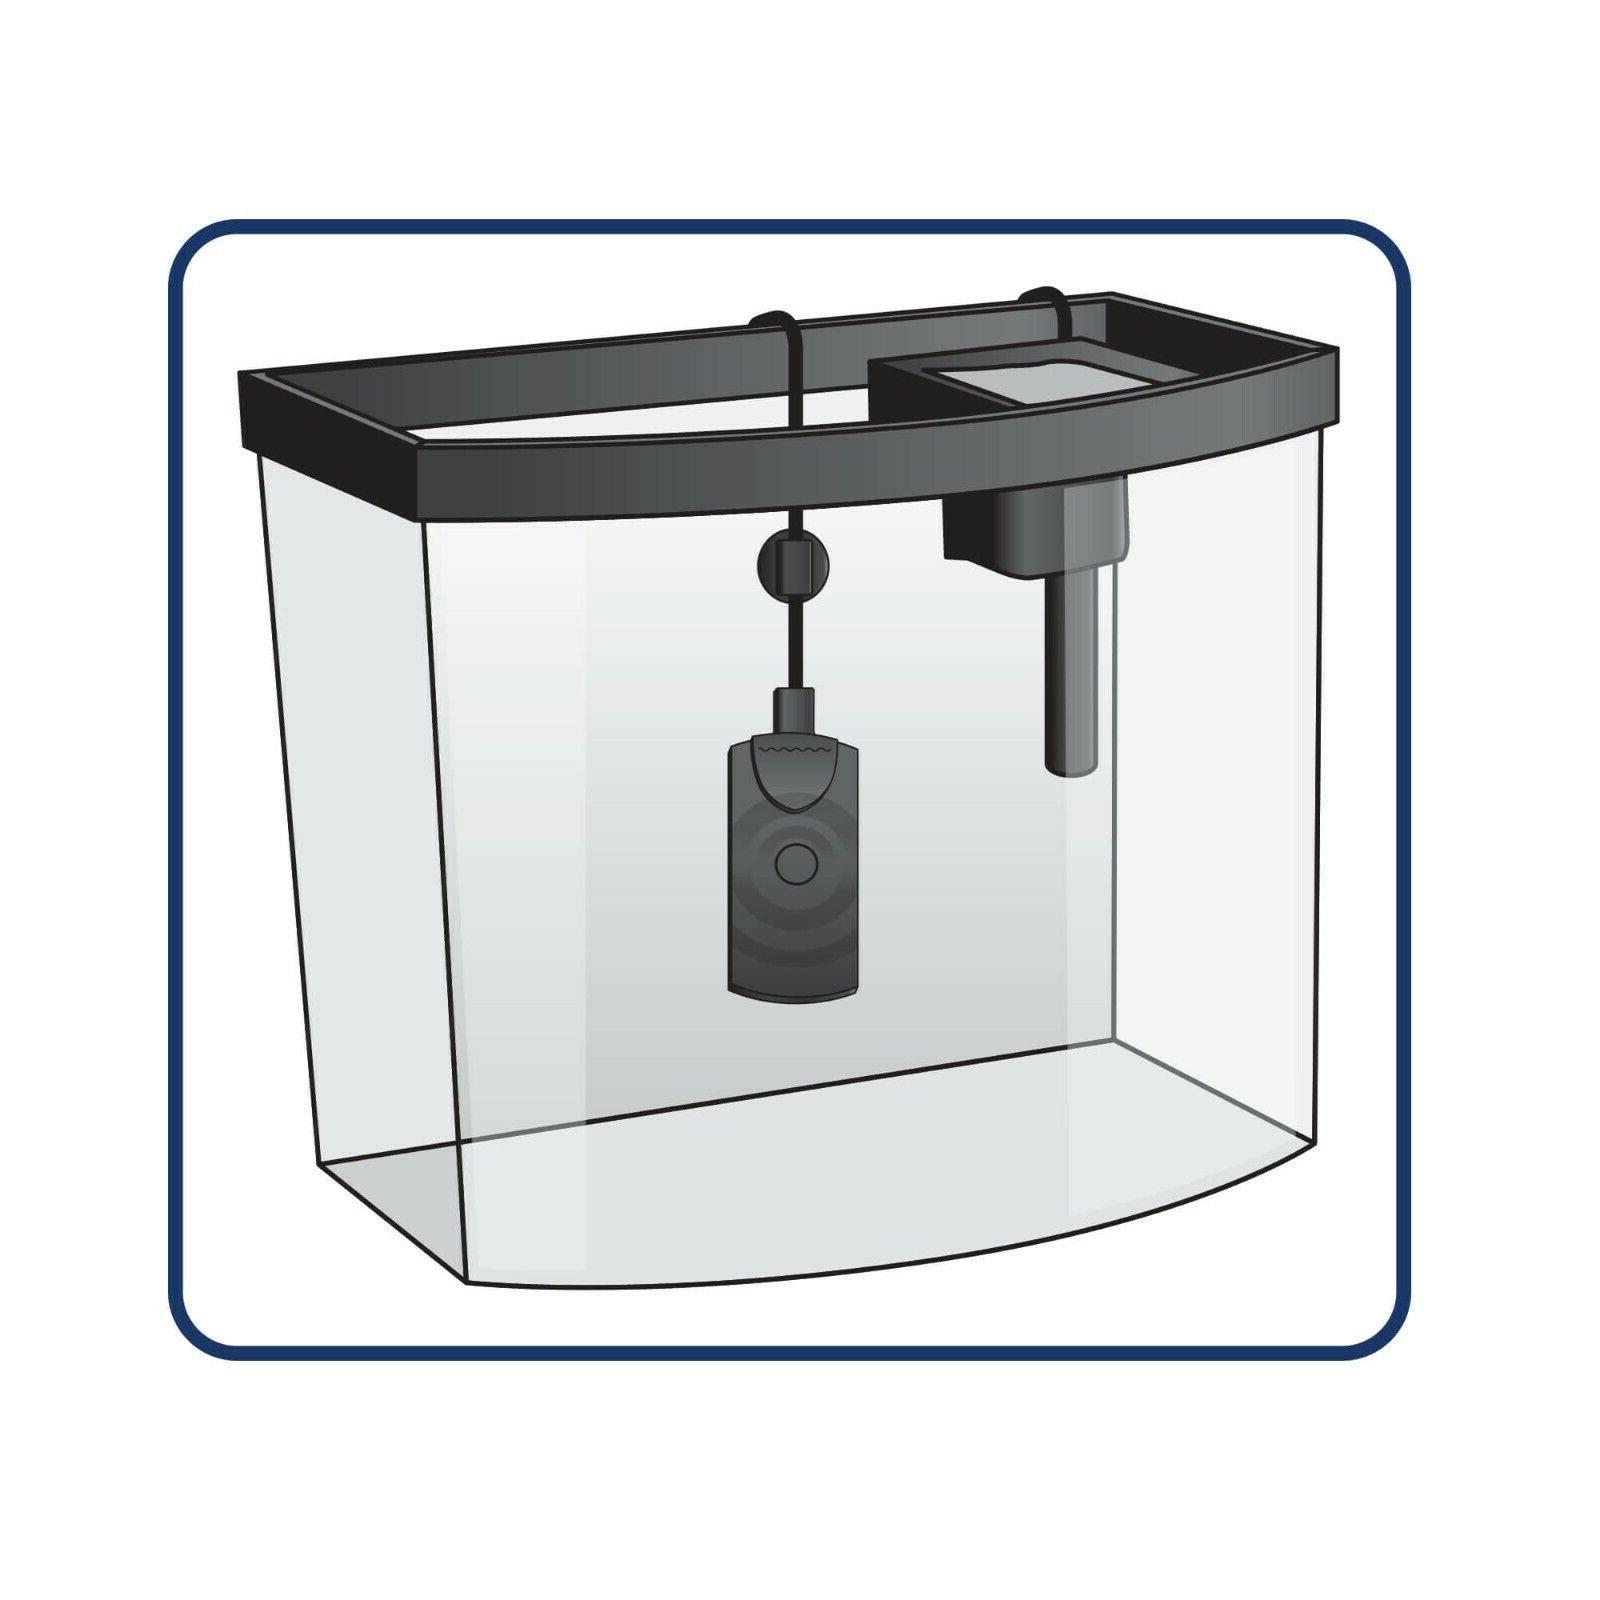 Aqueon Flat Aquarium Heater 5W/7.5W/15W 2-10 Gallon